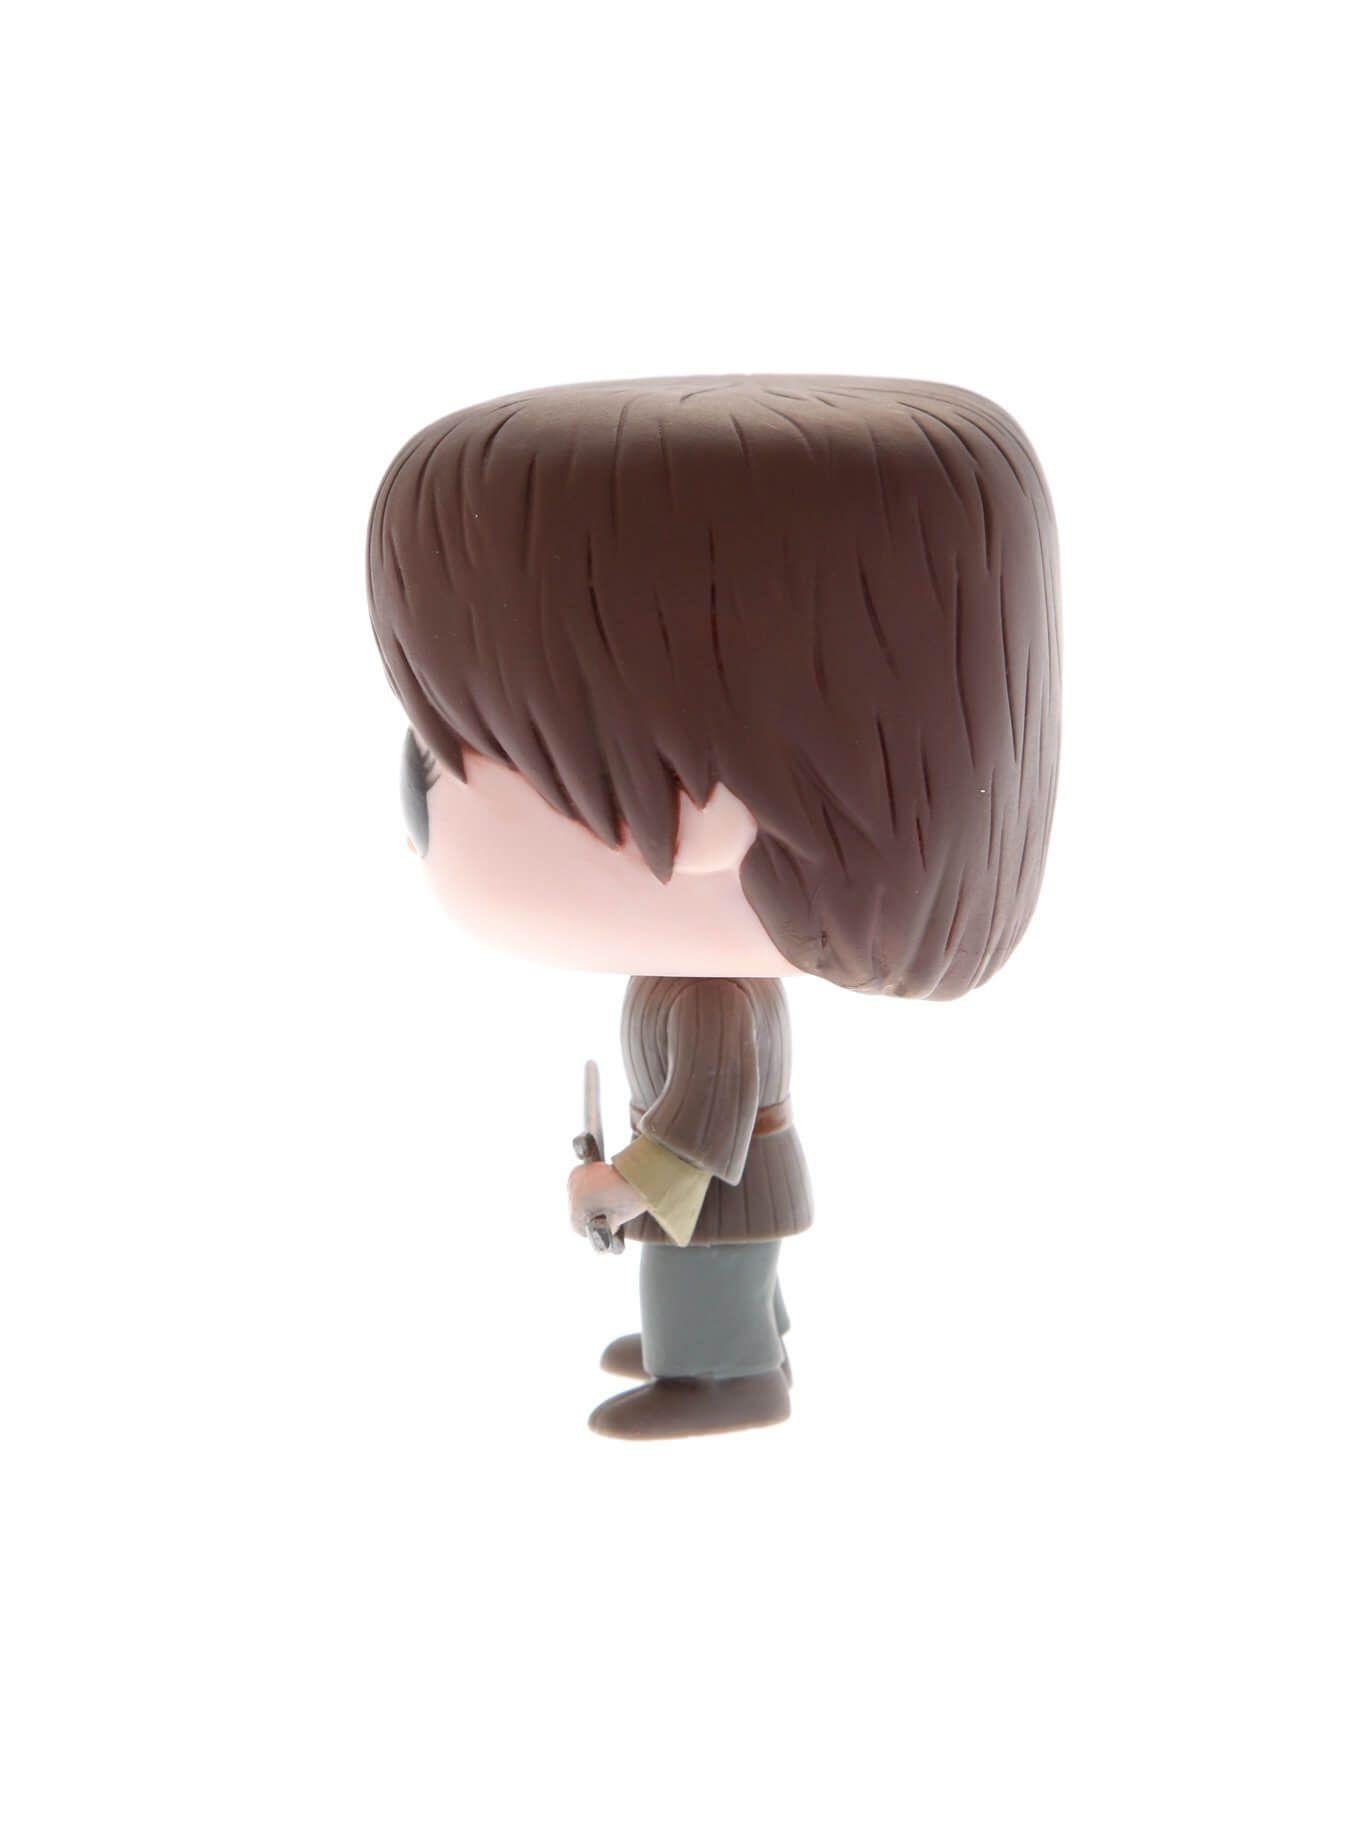 Arya Stark #09 - Game of Thrones - Funko Pop!